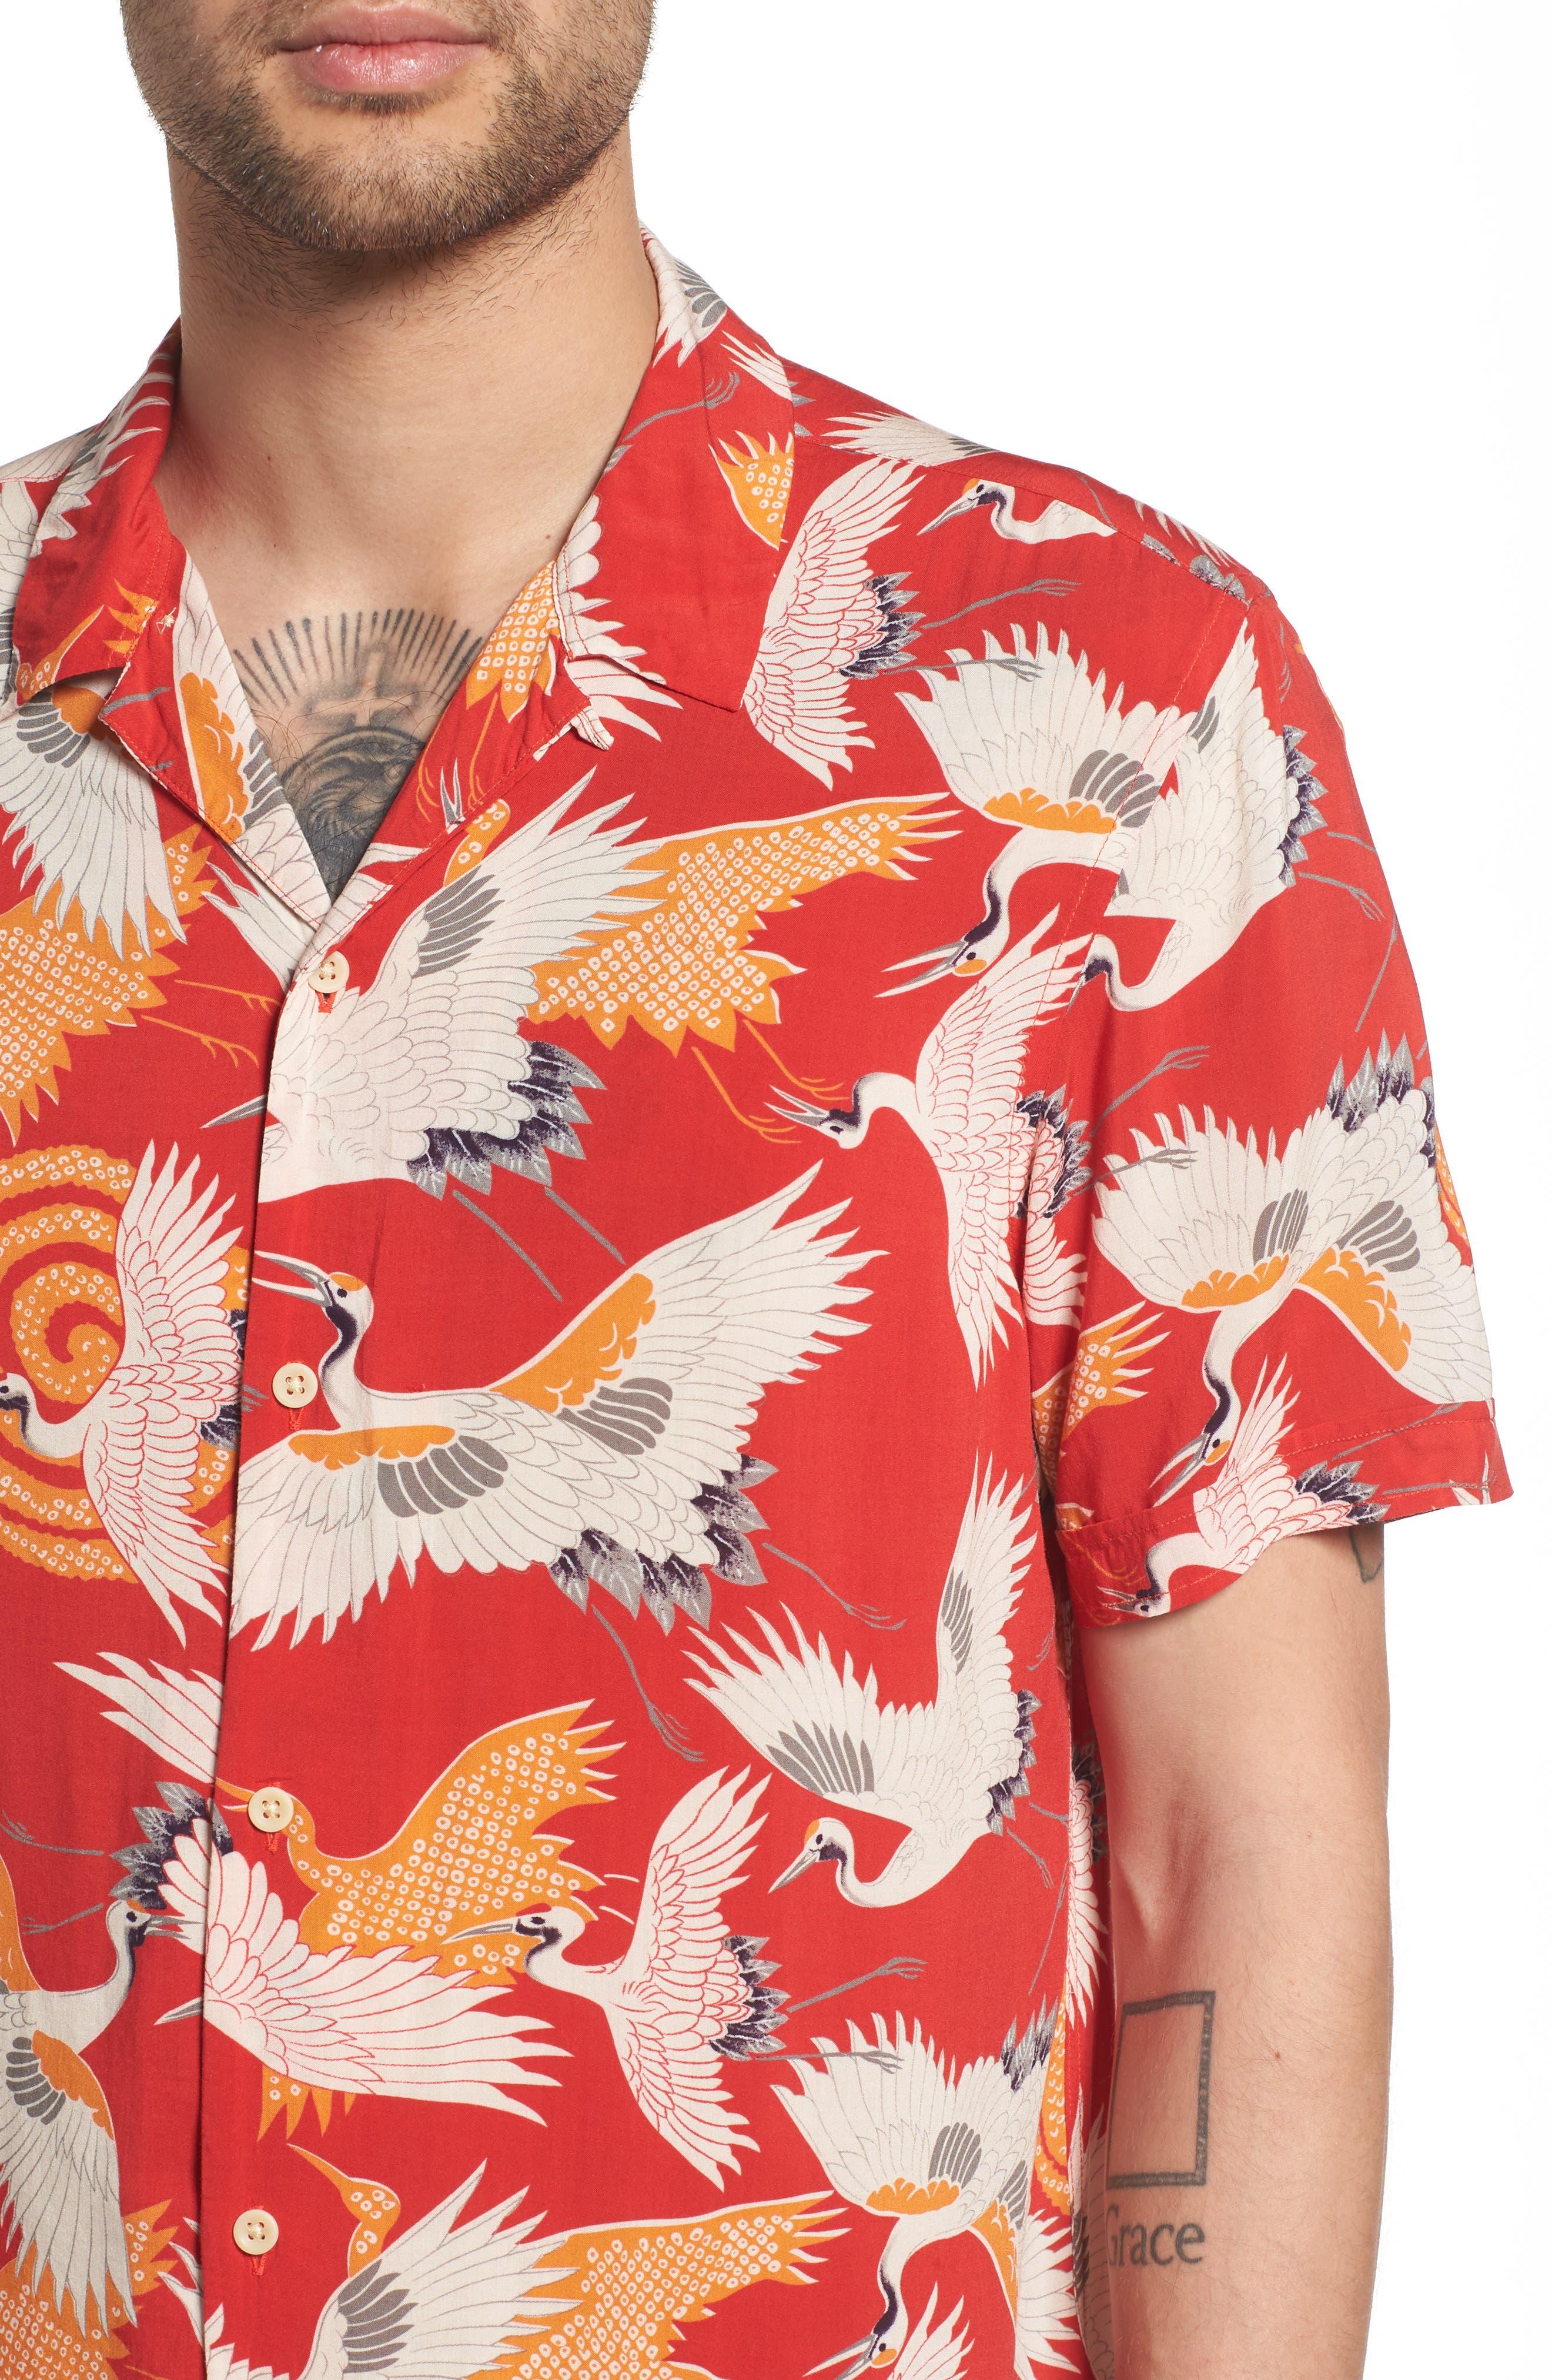 Tsuru Regular Fit Short Sleeve Sport Shirt,                             Alternate thumbnail 4, color,                             600